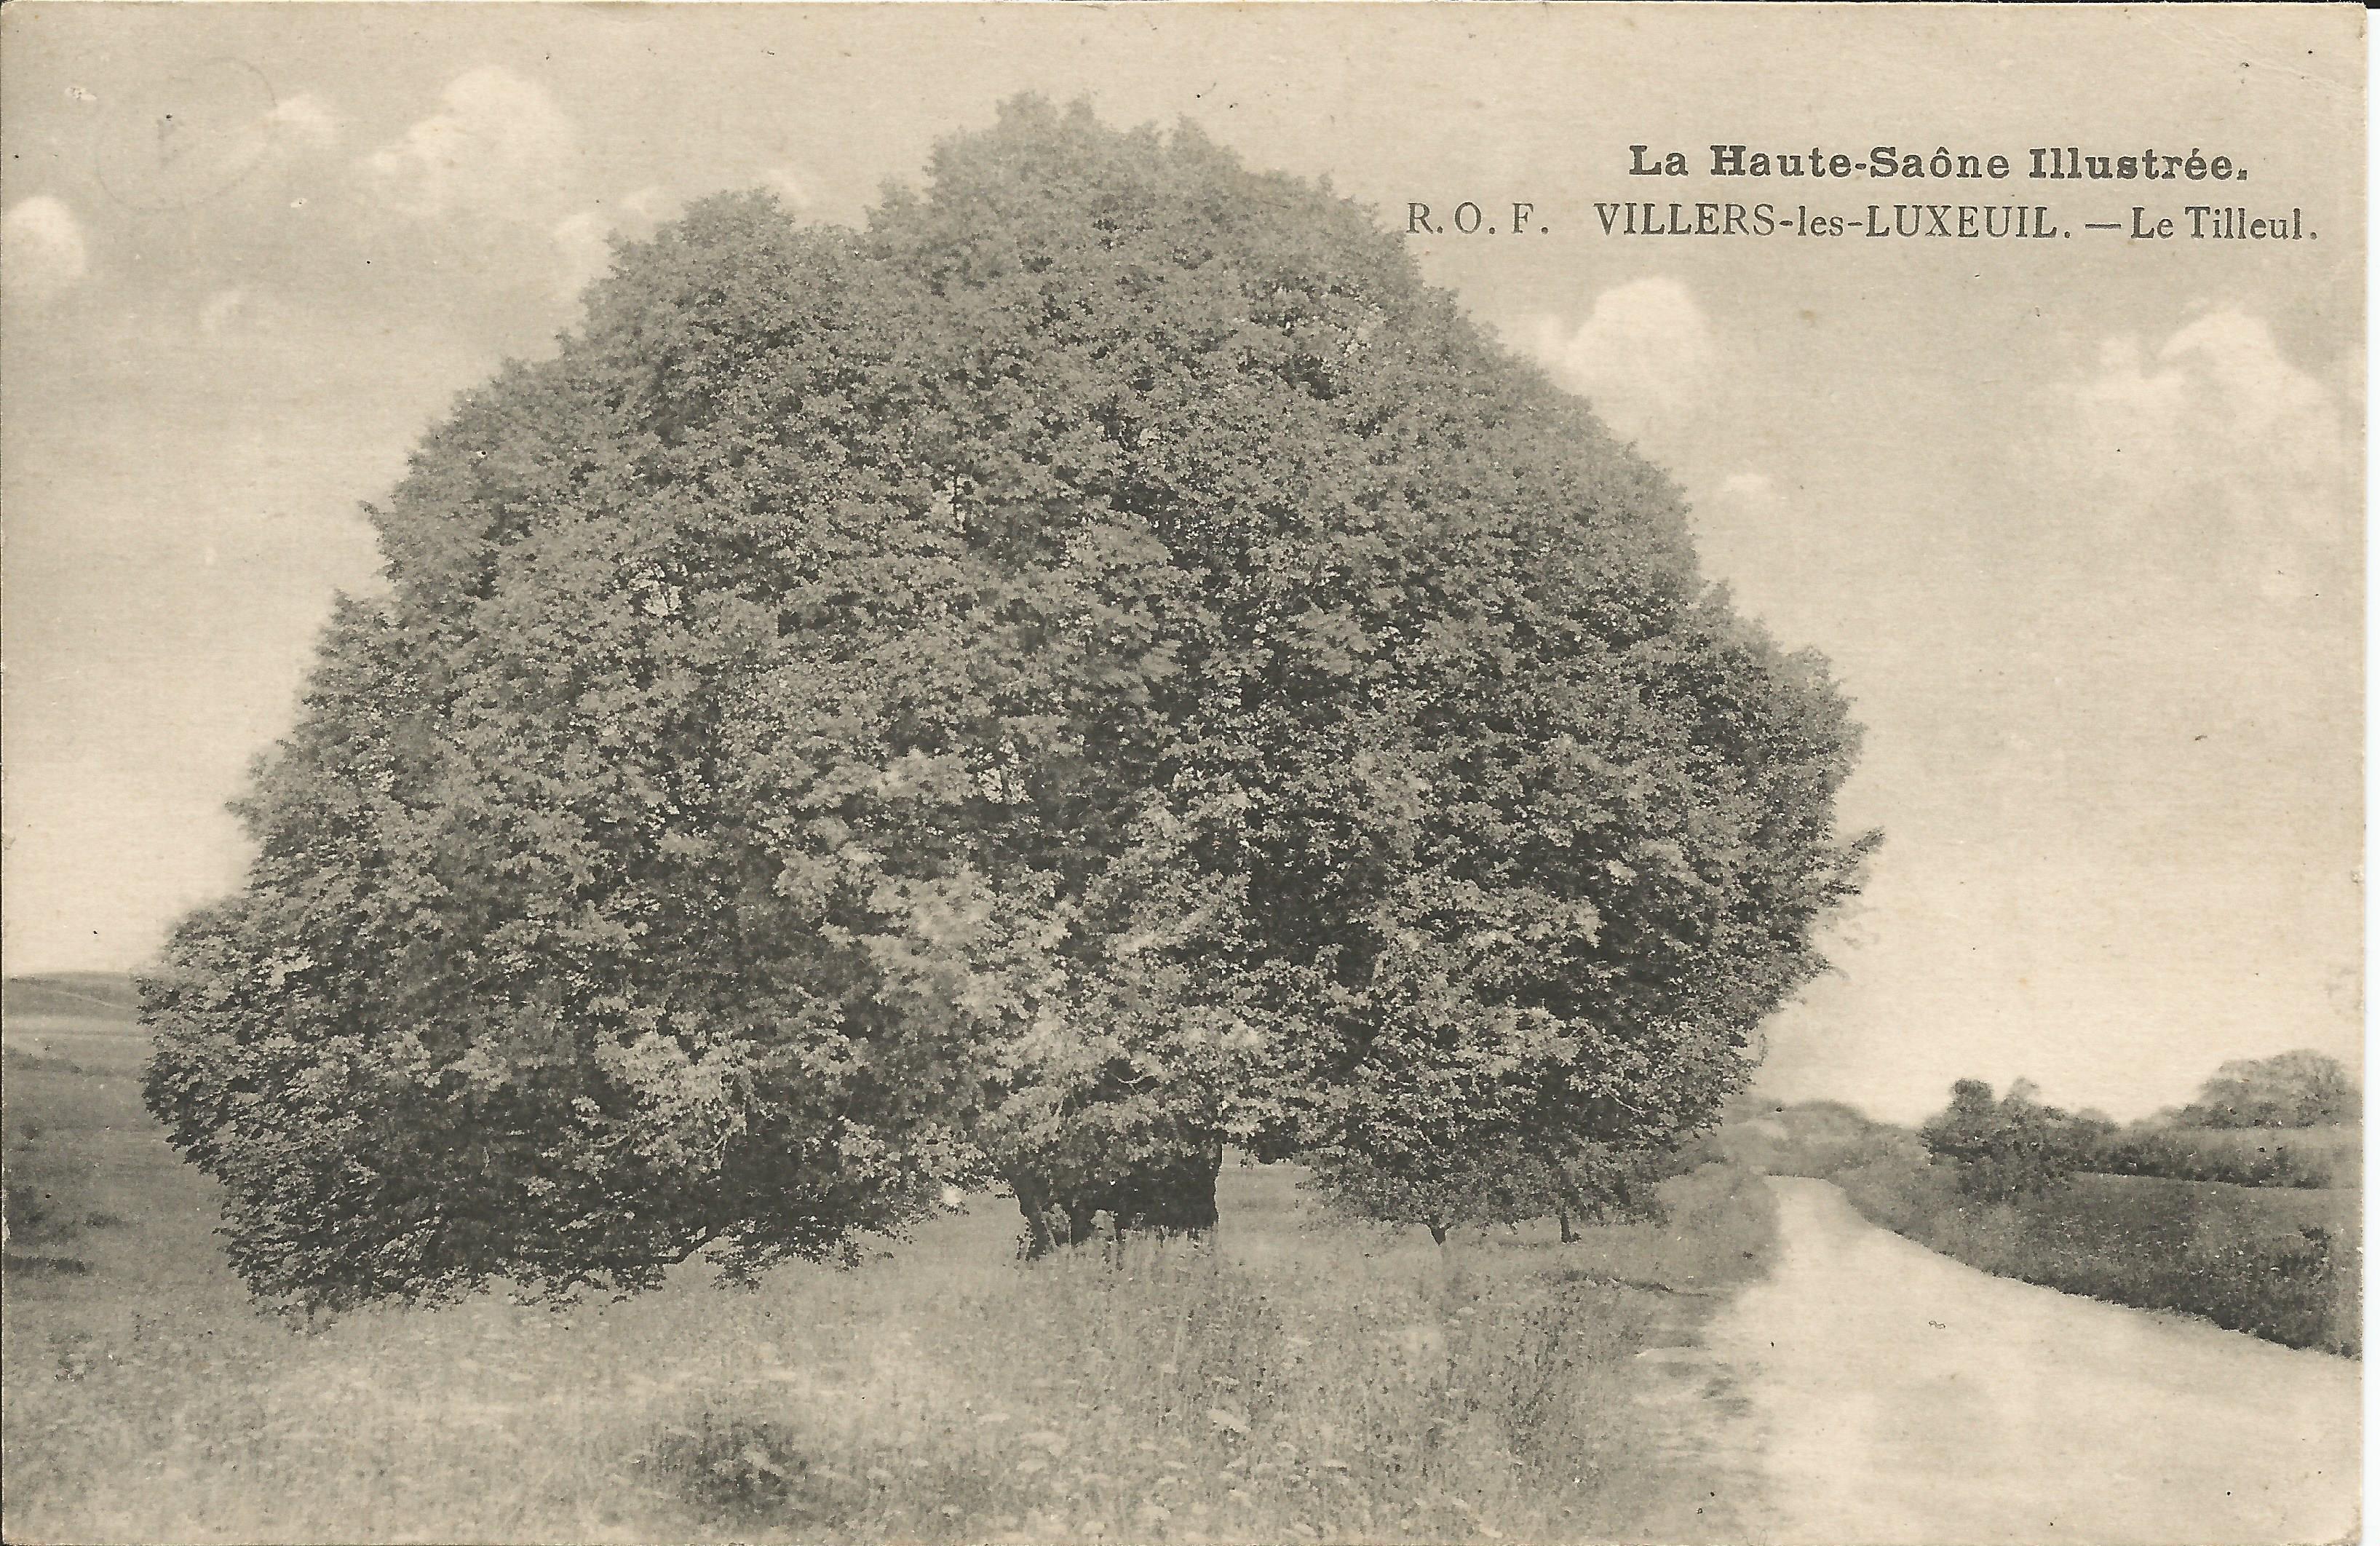 https://www.villers-les-luxeuil.com/projets/villers/files/images/Cartes_postales/Tilleul_2015/Le_Tilleul_4.jpg